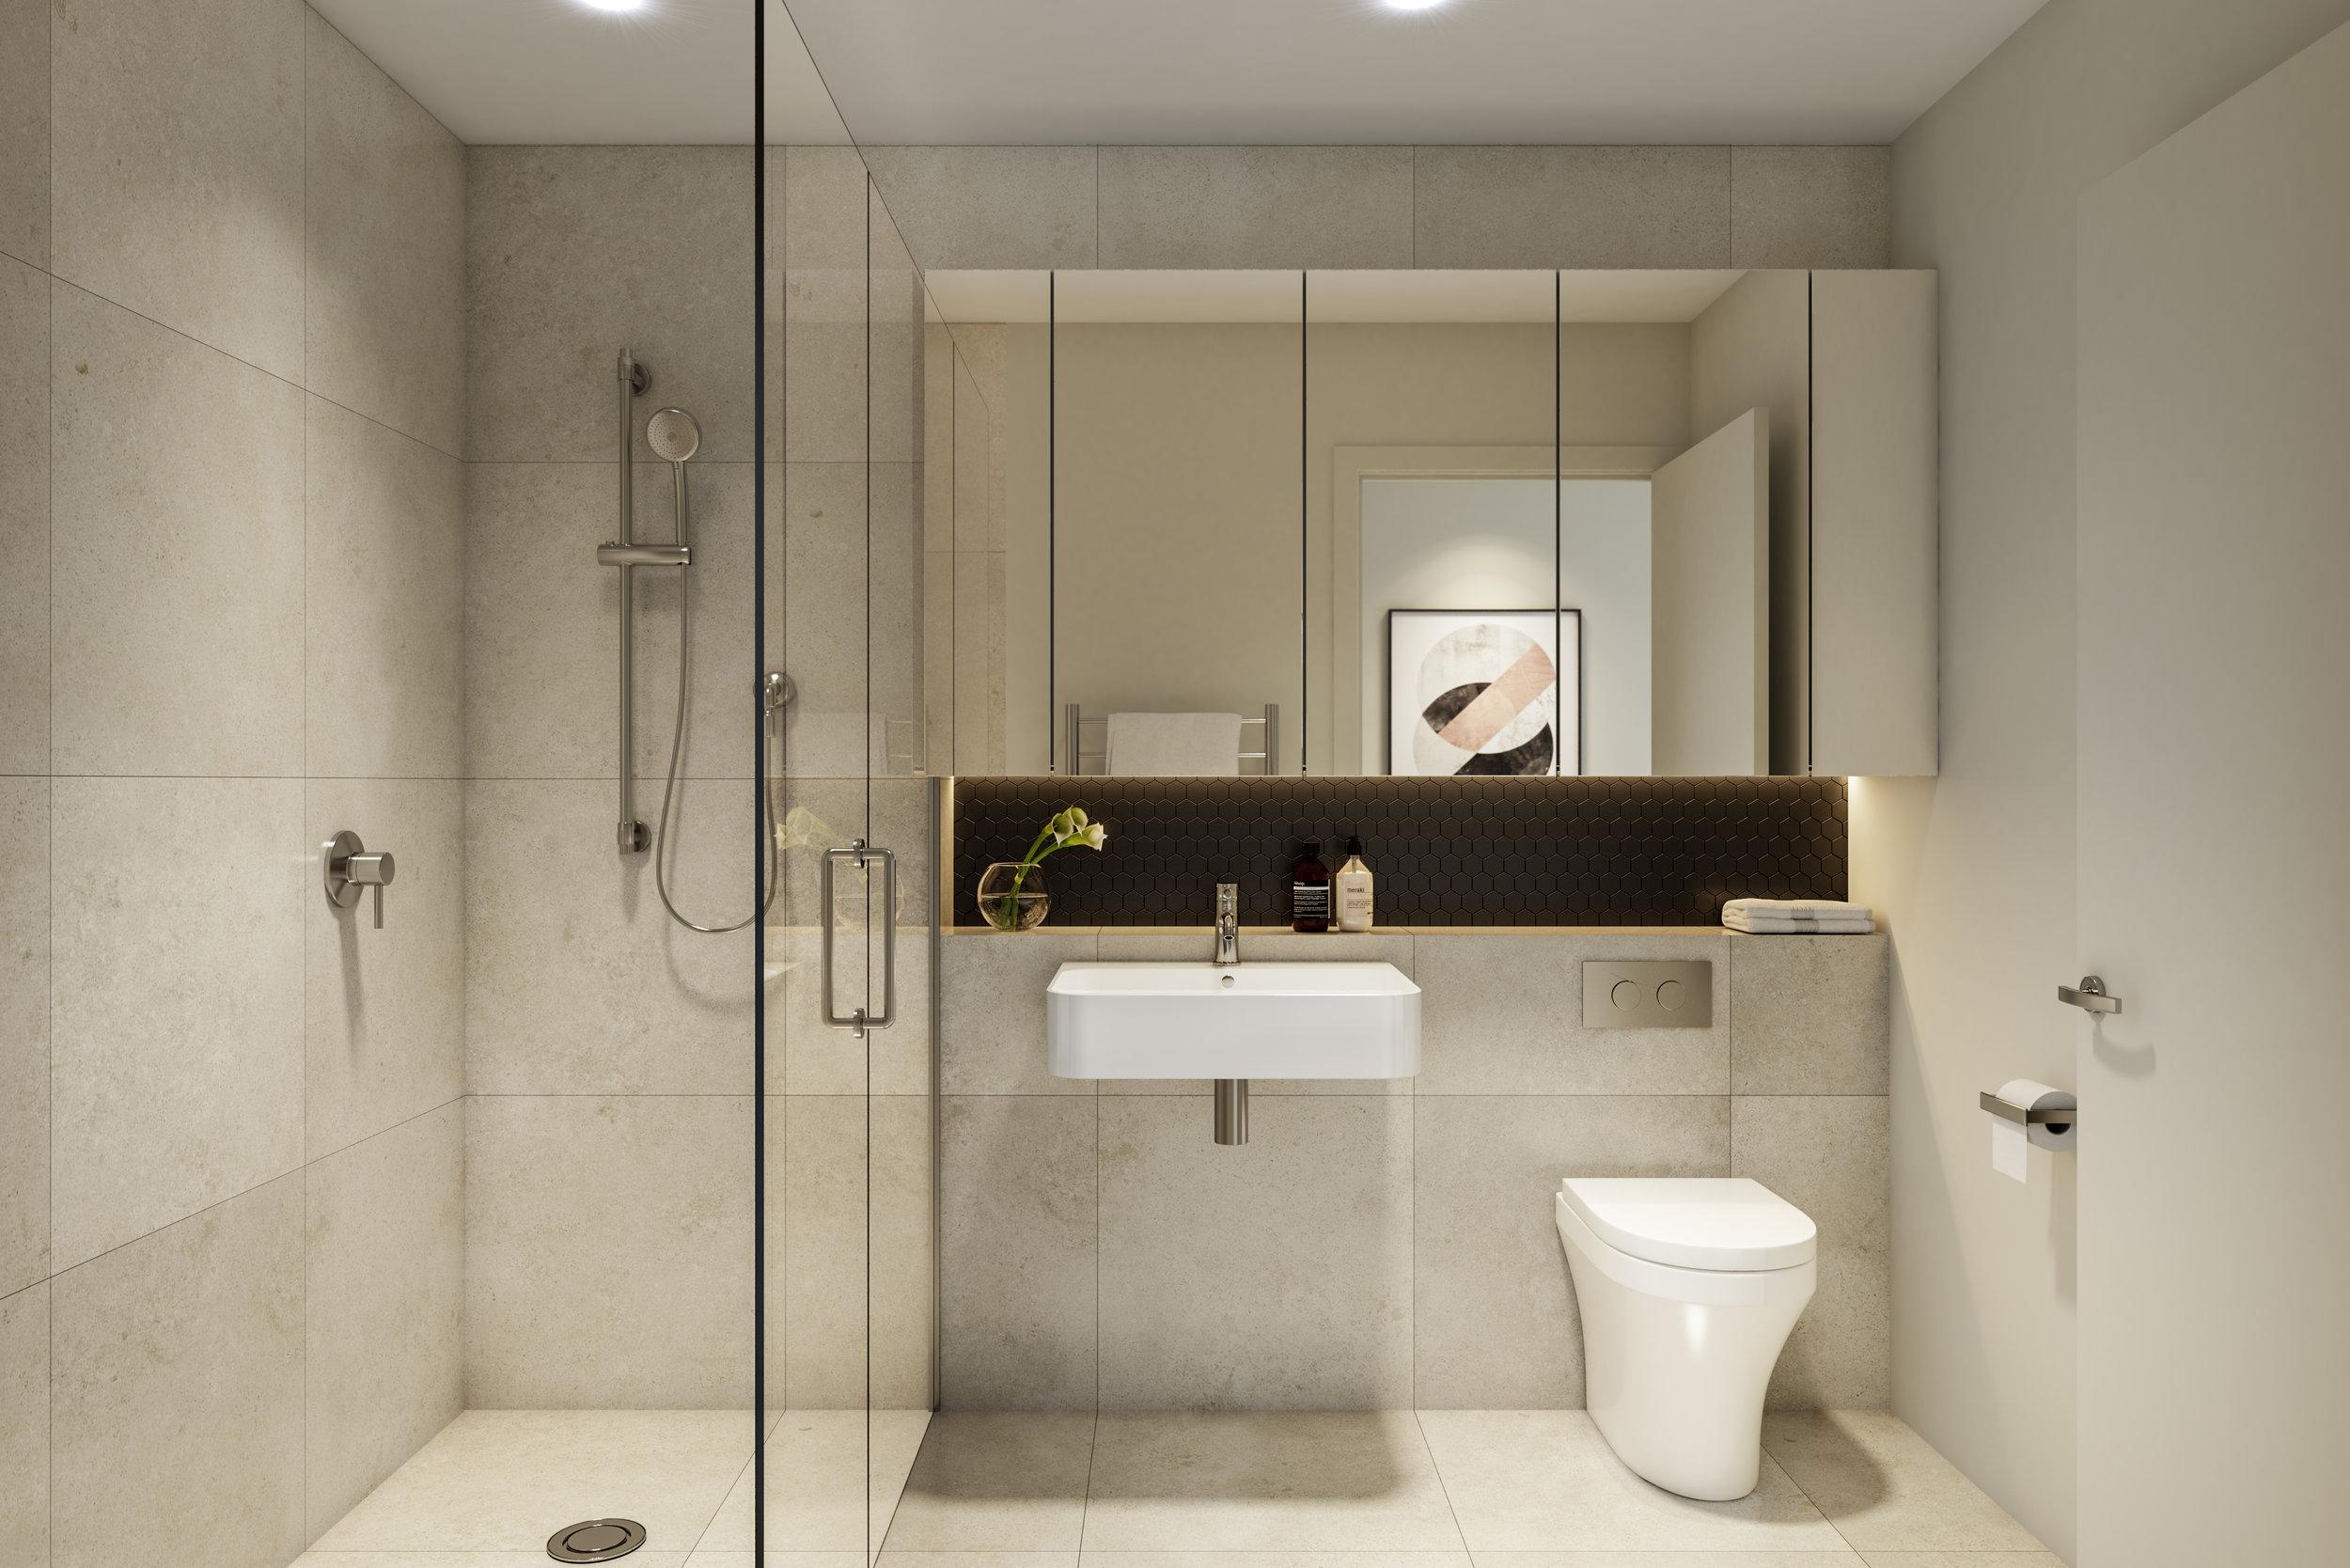 Latitude_Int_Bathroom_Final02.jpg